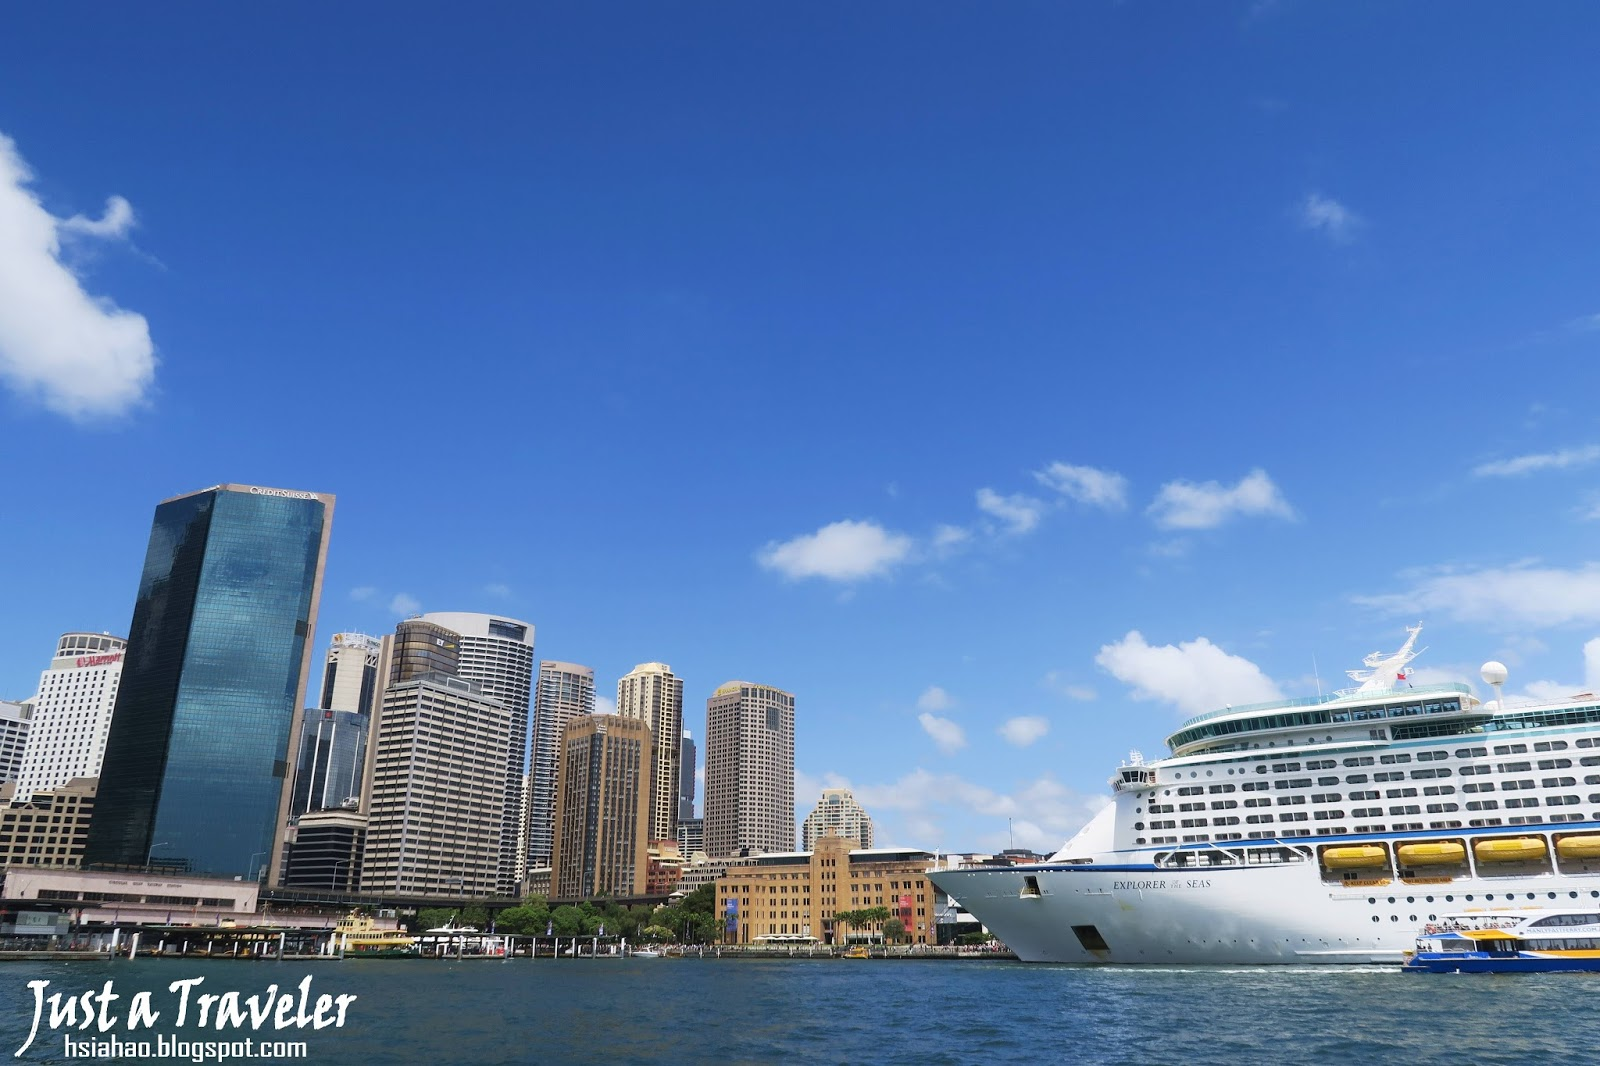 雪梨-景點-推薦-雪梨港-Circular-Quay-旅遊-自由行-澳洲-Sydney-Tourist-Attraction-Travel-Australia